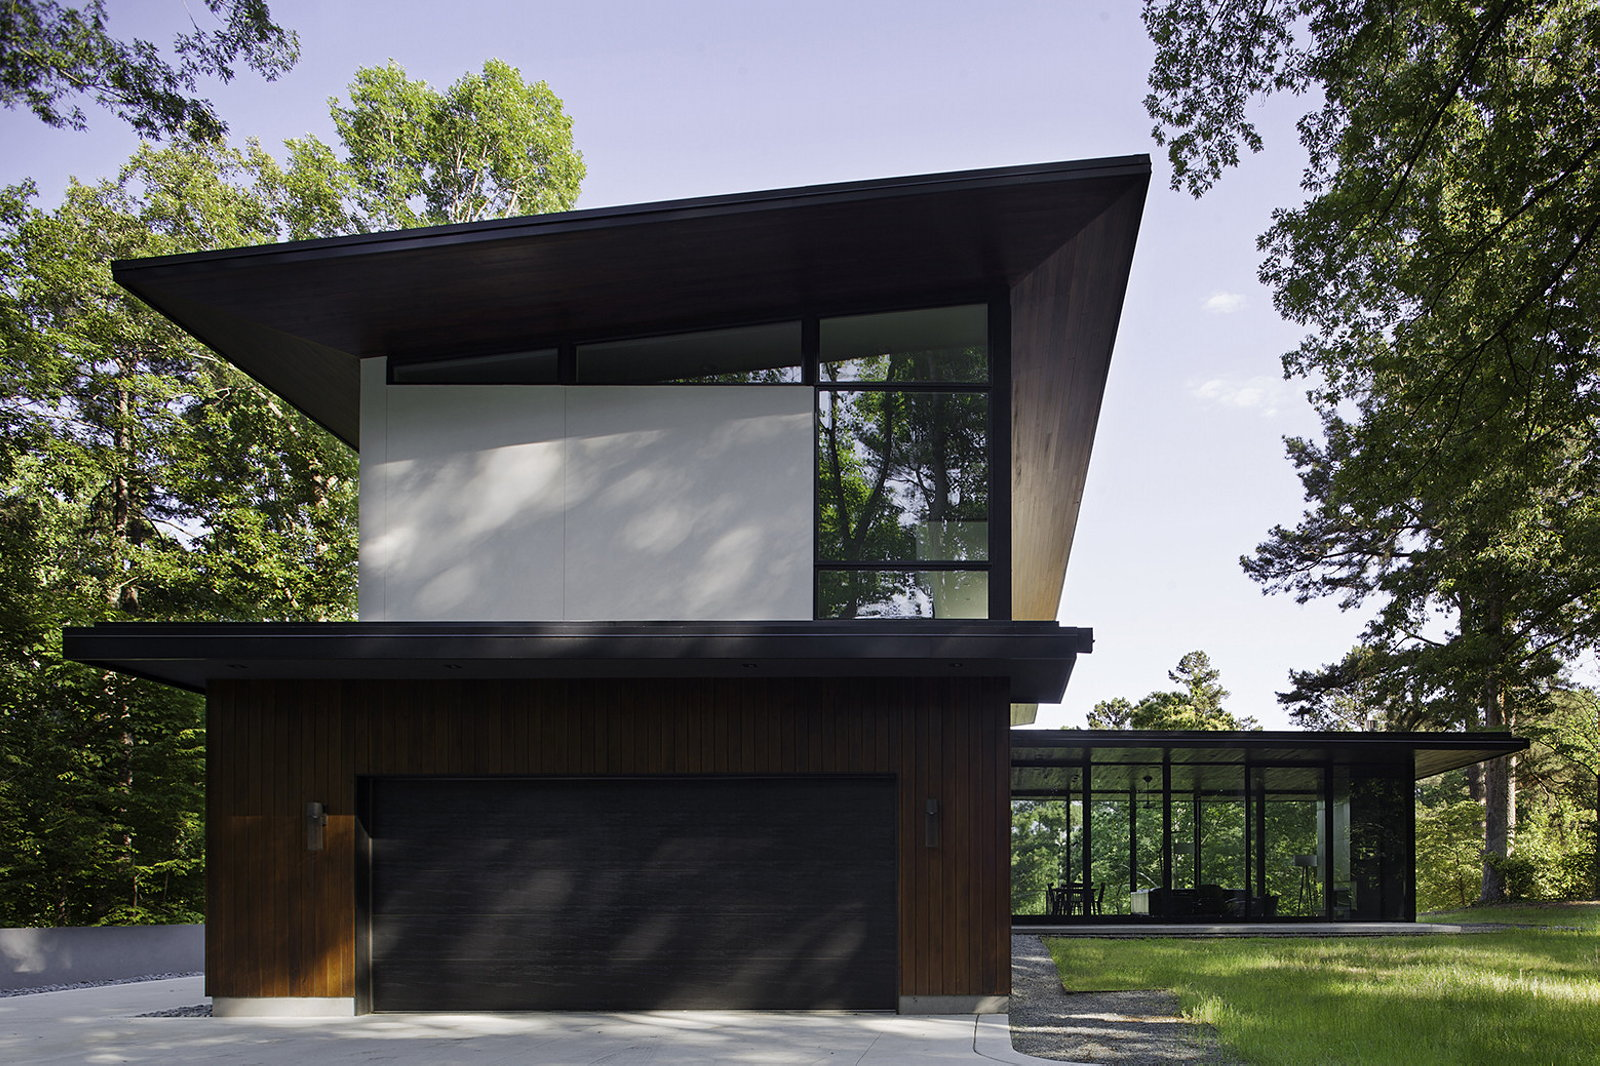 modern house clark court by in situ studio. Black Bedroom Furniture Sets. Home Design Ideas